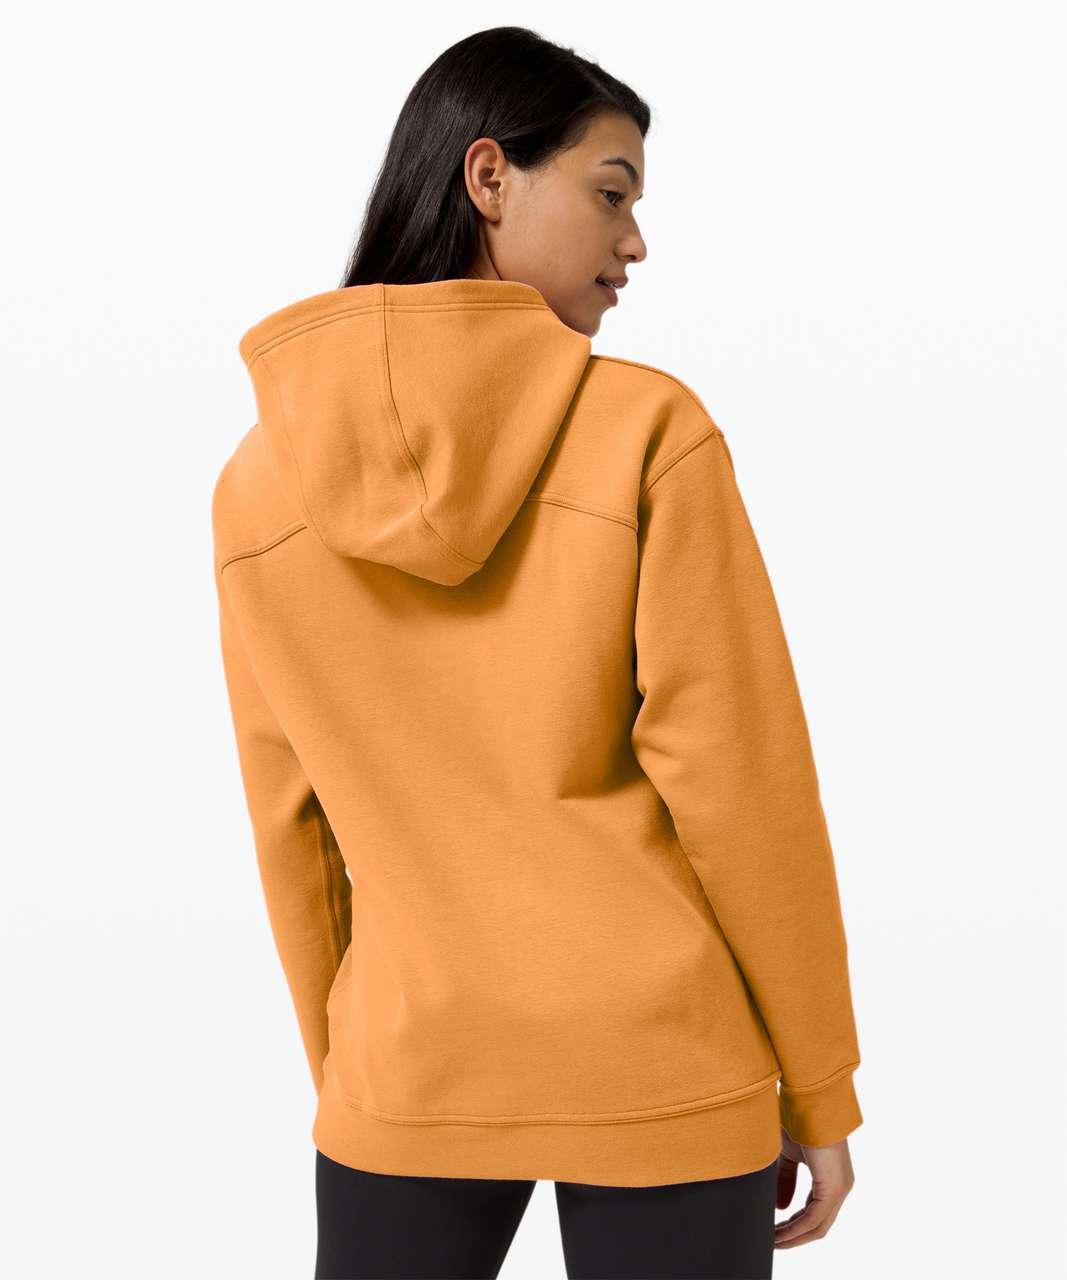 Lululemon All Yours Hoodie - Monarch Orange